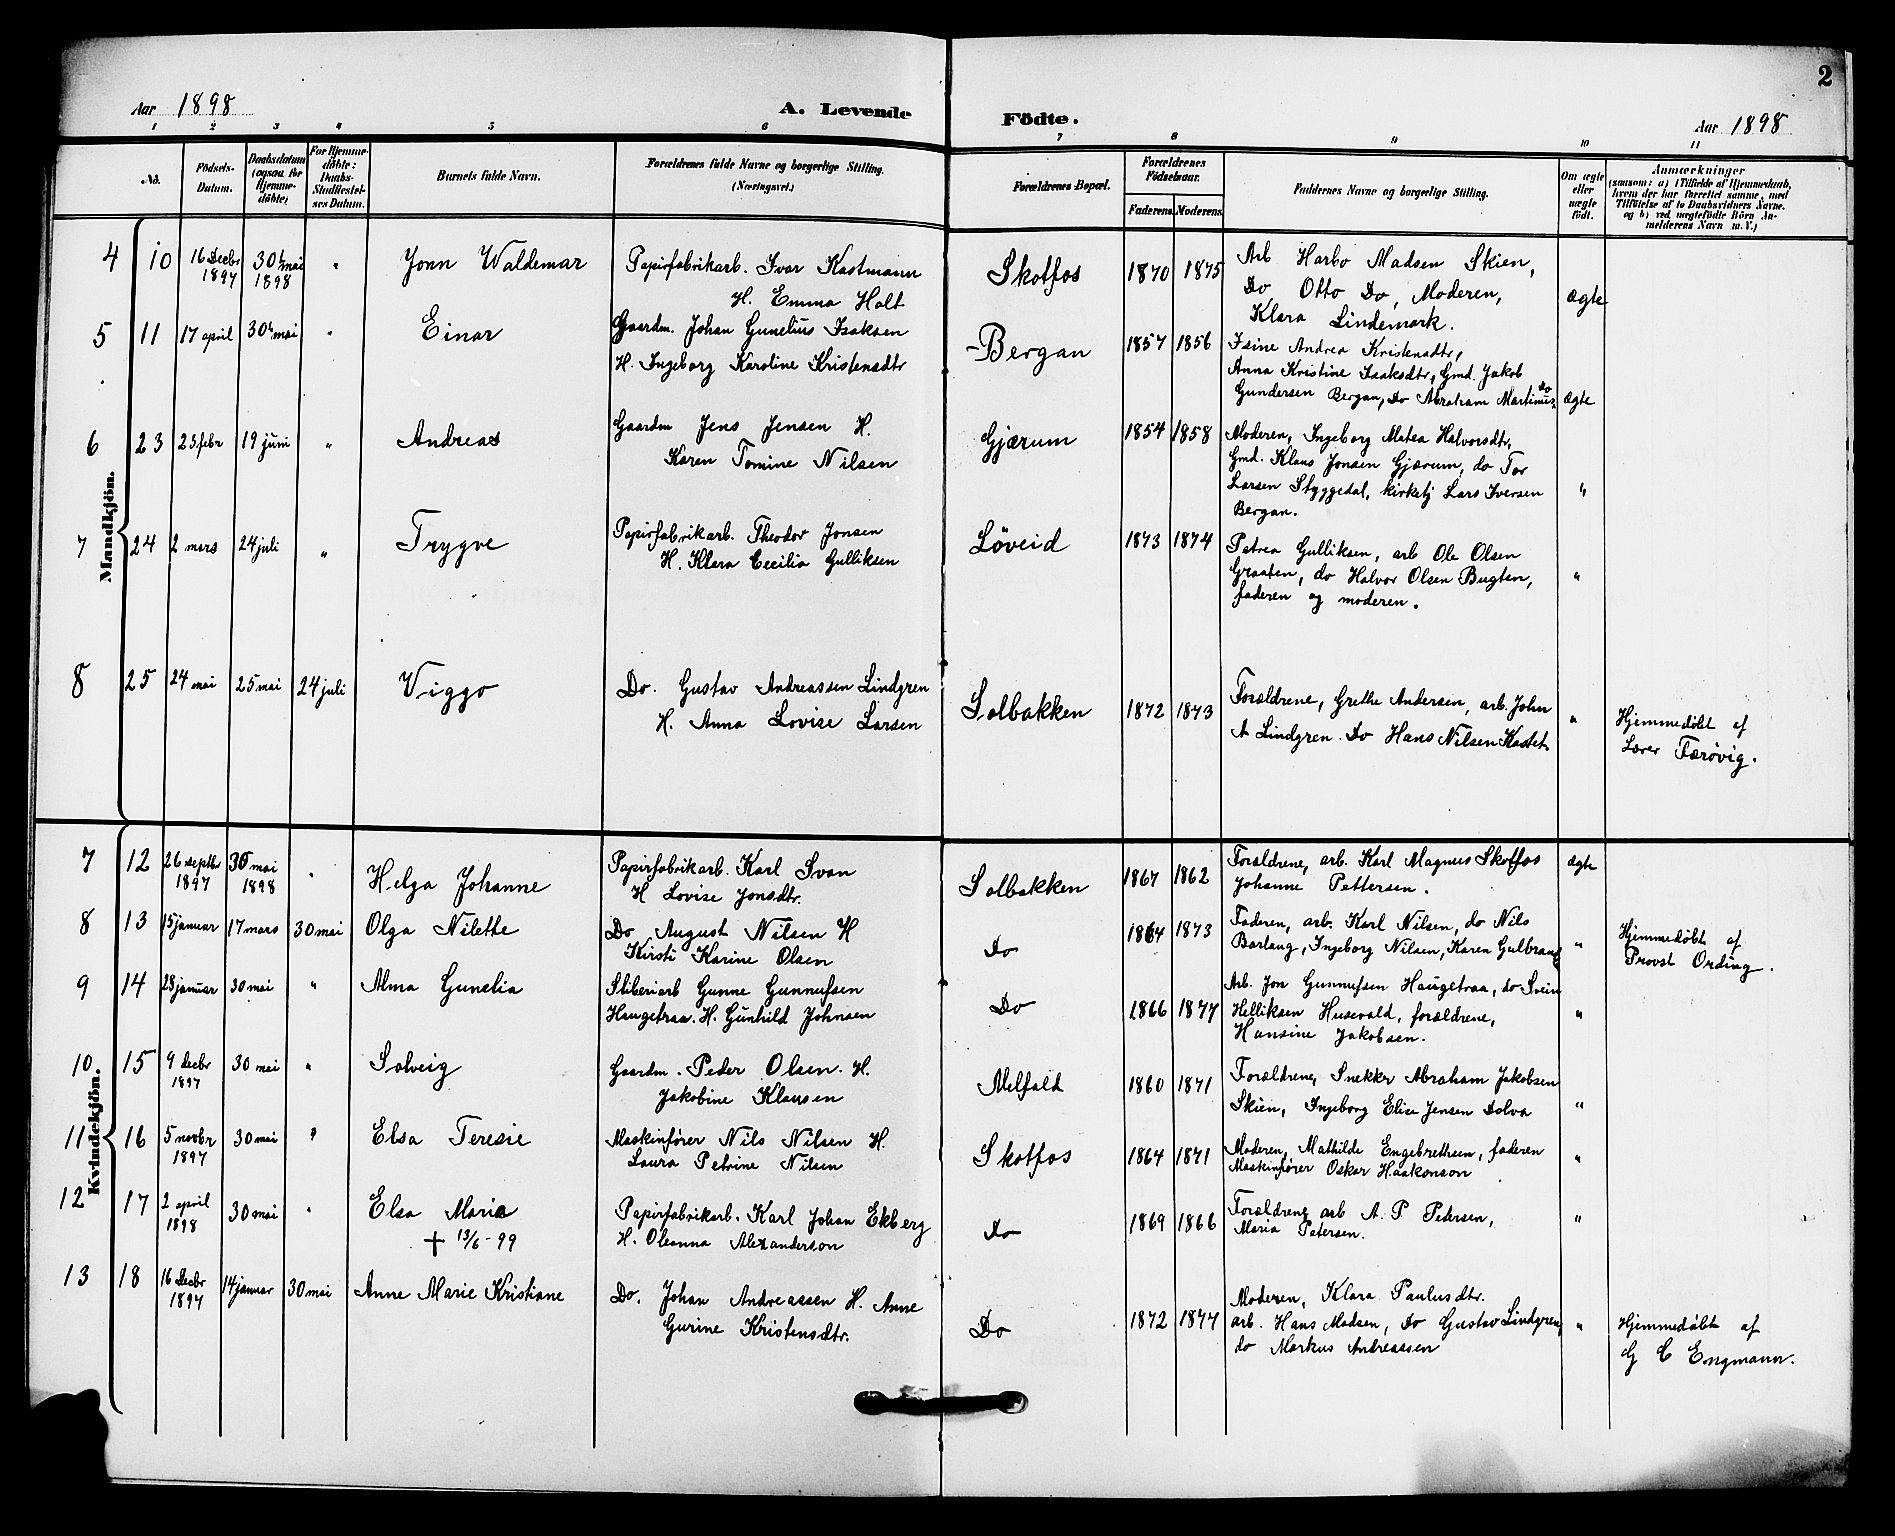 SAKO, Solum kirkebøker, G/Gb/L0004: Klokkerbok nr. II 4, 1898-1905, s. 2